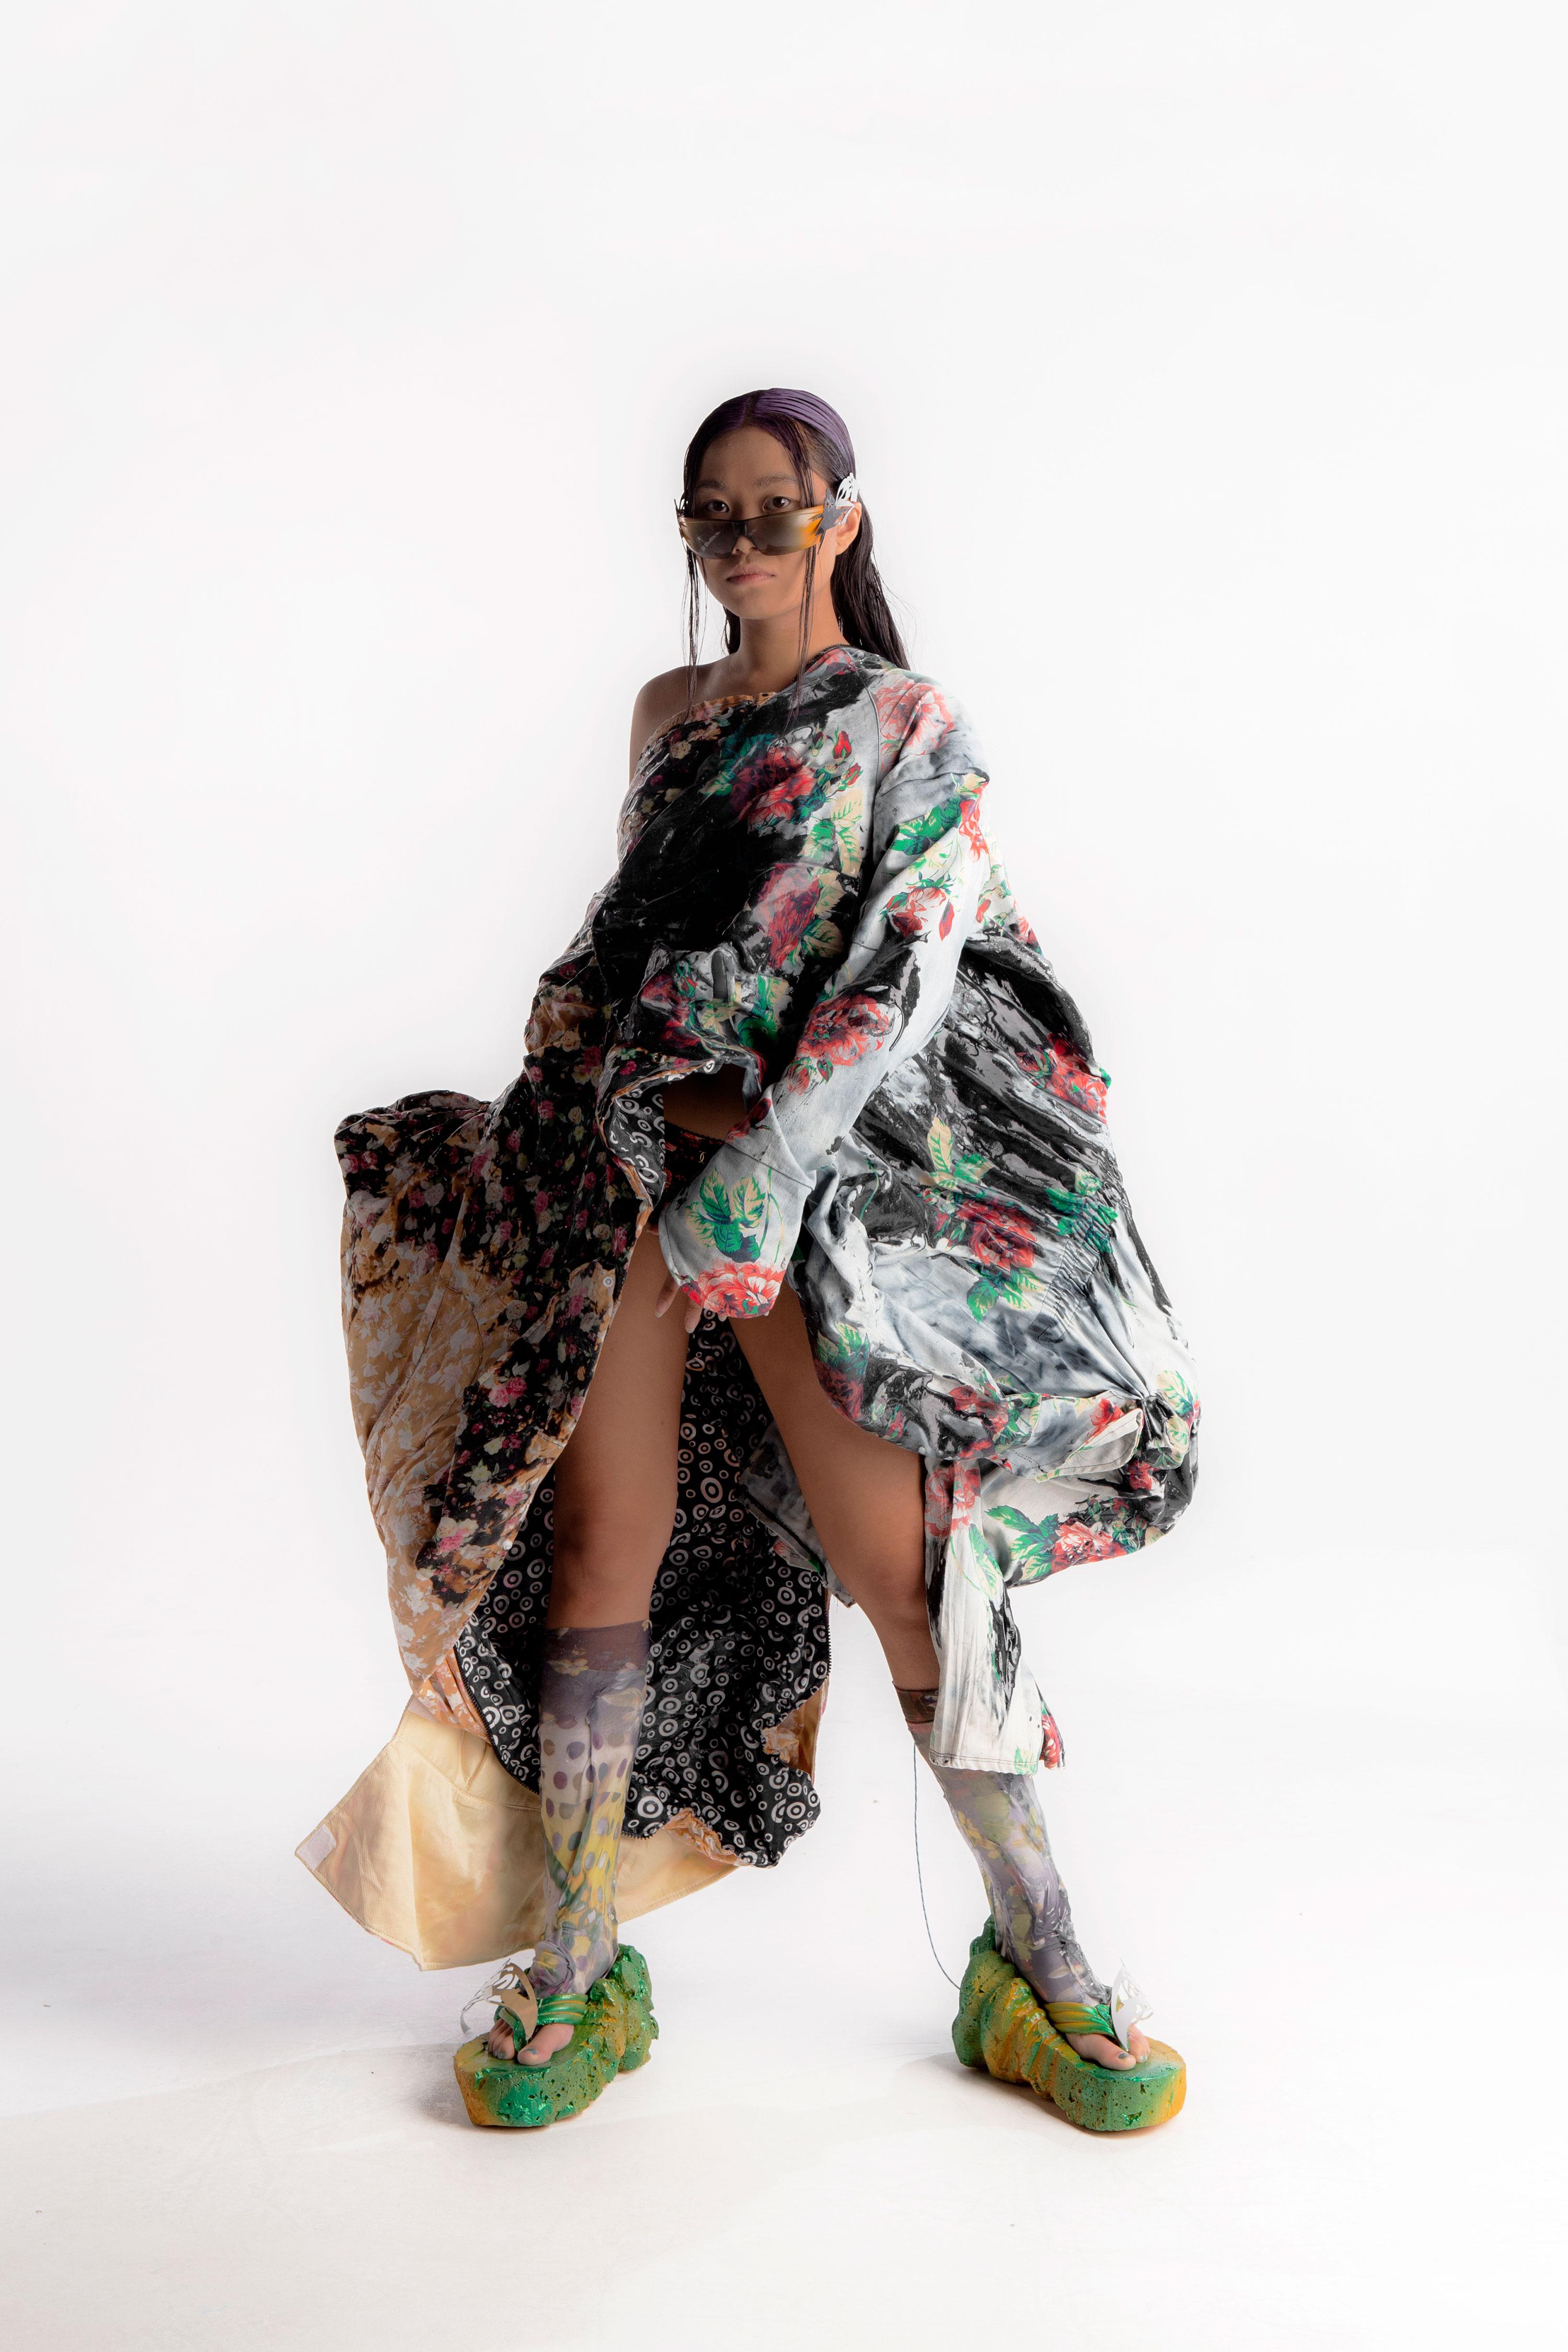 Graduate Fashion Designer Accuses Balenciaga Of Stealing Her Idea Cnn Style